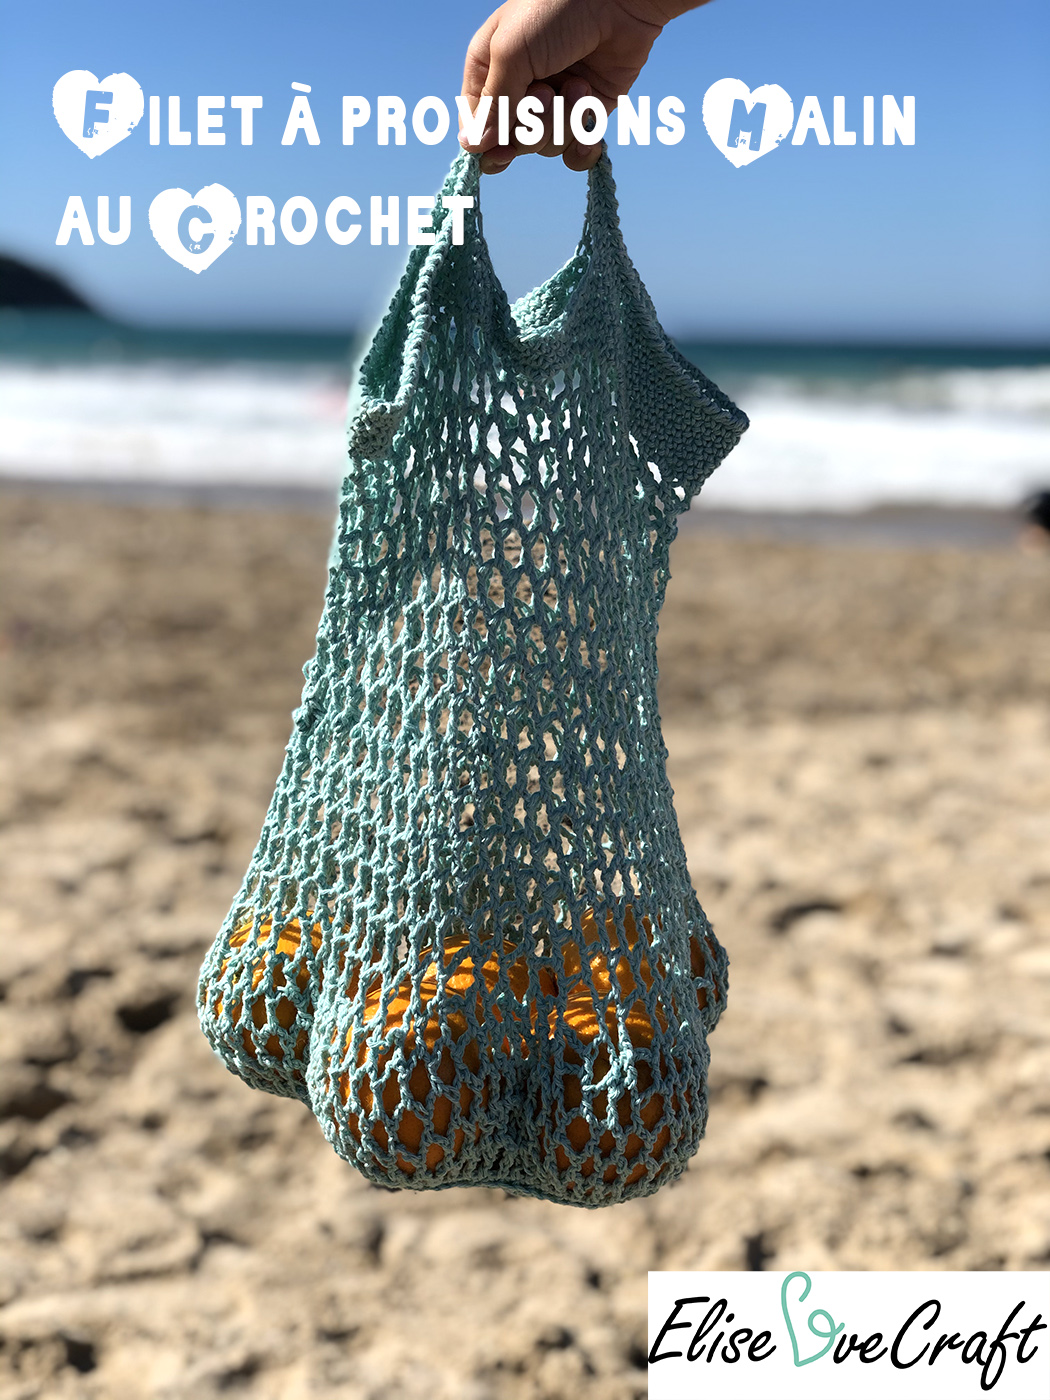 sac a provisions crochet PinIt